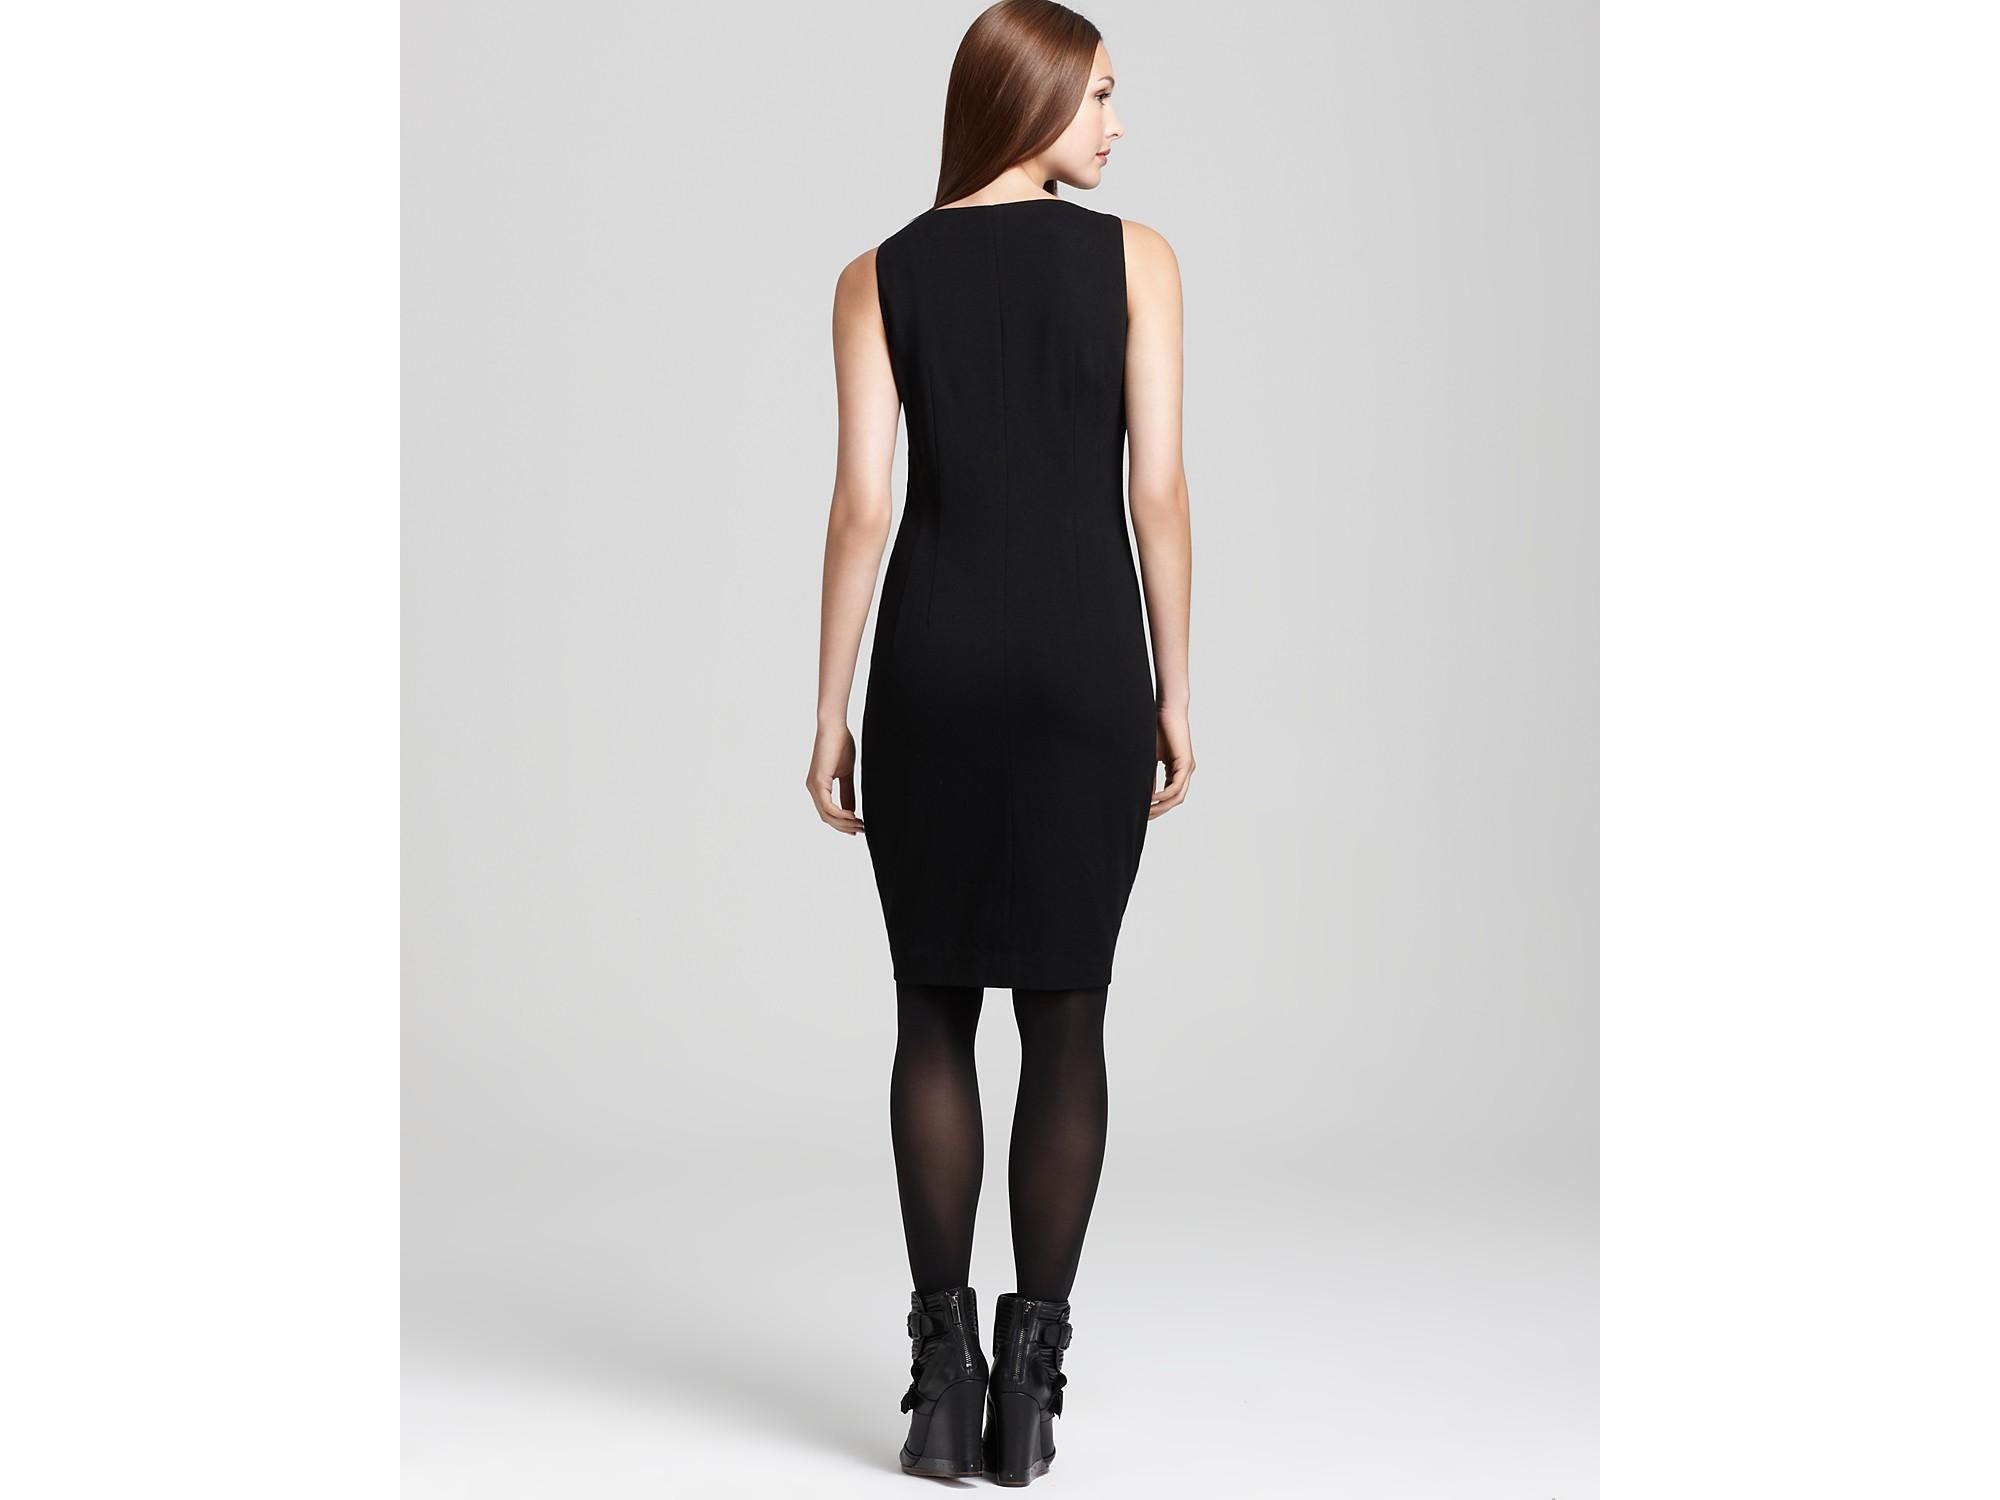 Dkny C Sheath Dress With Exposed Side Zipper In Black Lyst